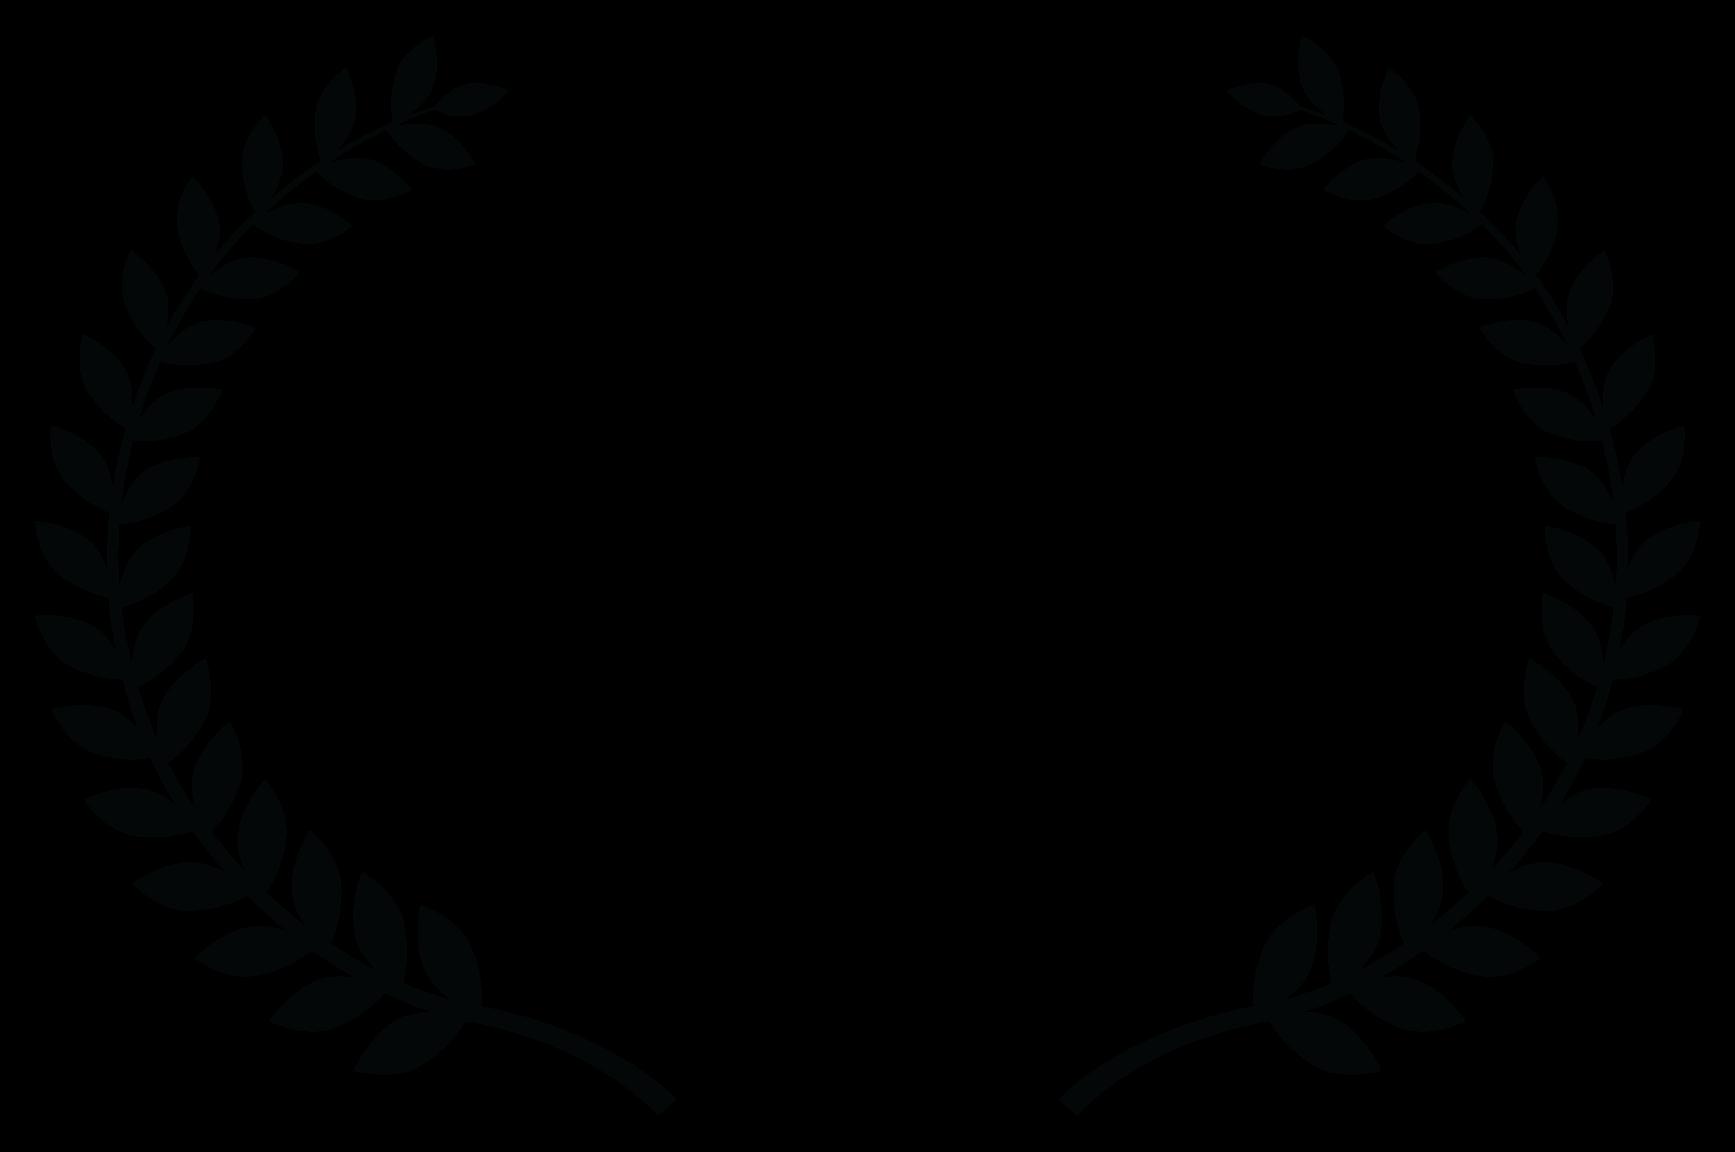 OFFICIAL SELECTION - Rieti Sabina Film Festival - 2018